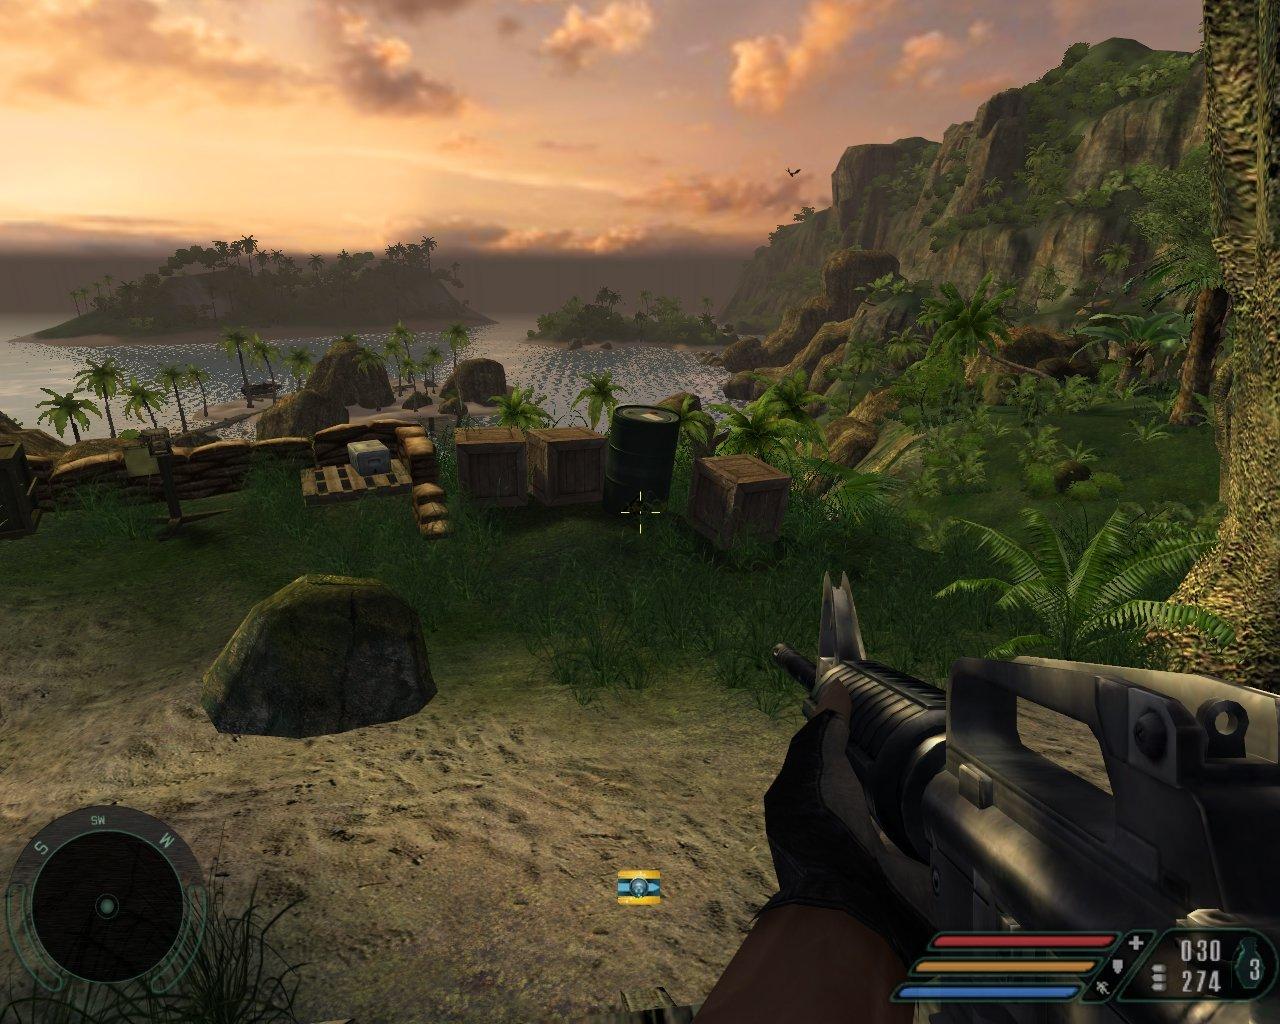 Far Cry 1.1 R360 SM 2.0 1280x1024 maxAA/maxAF